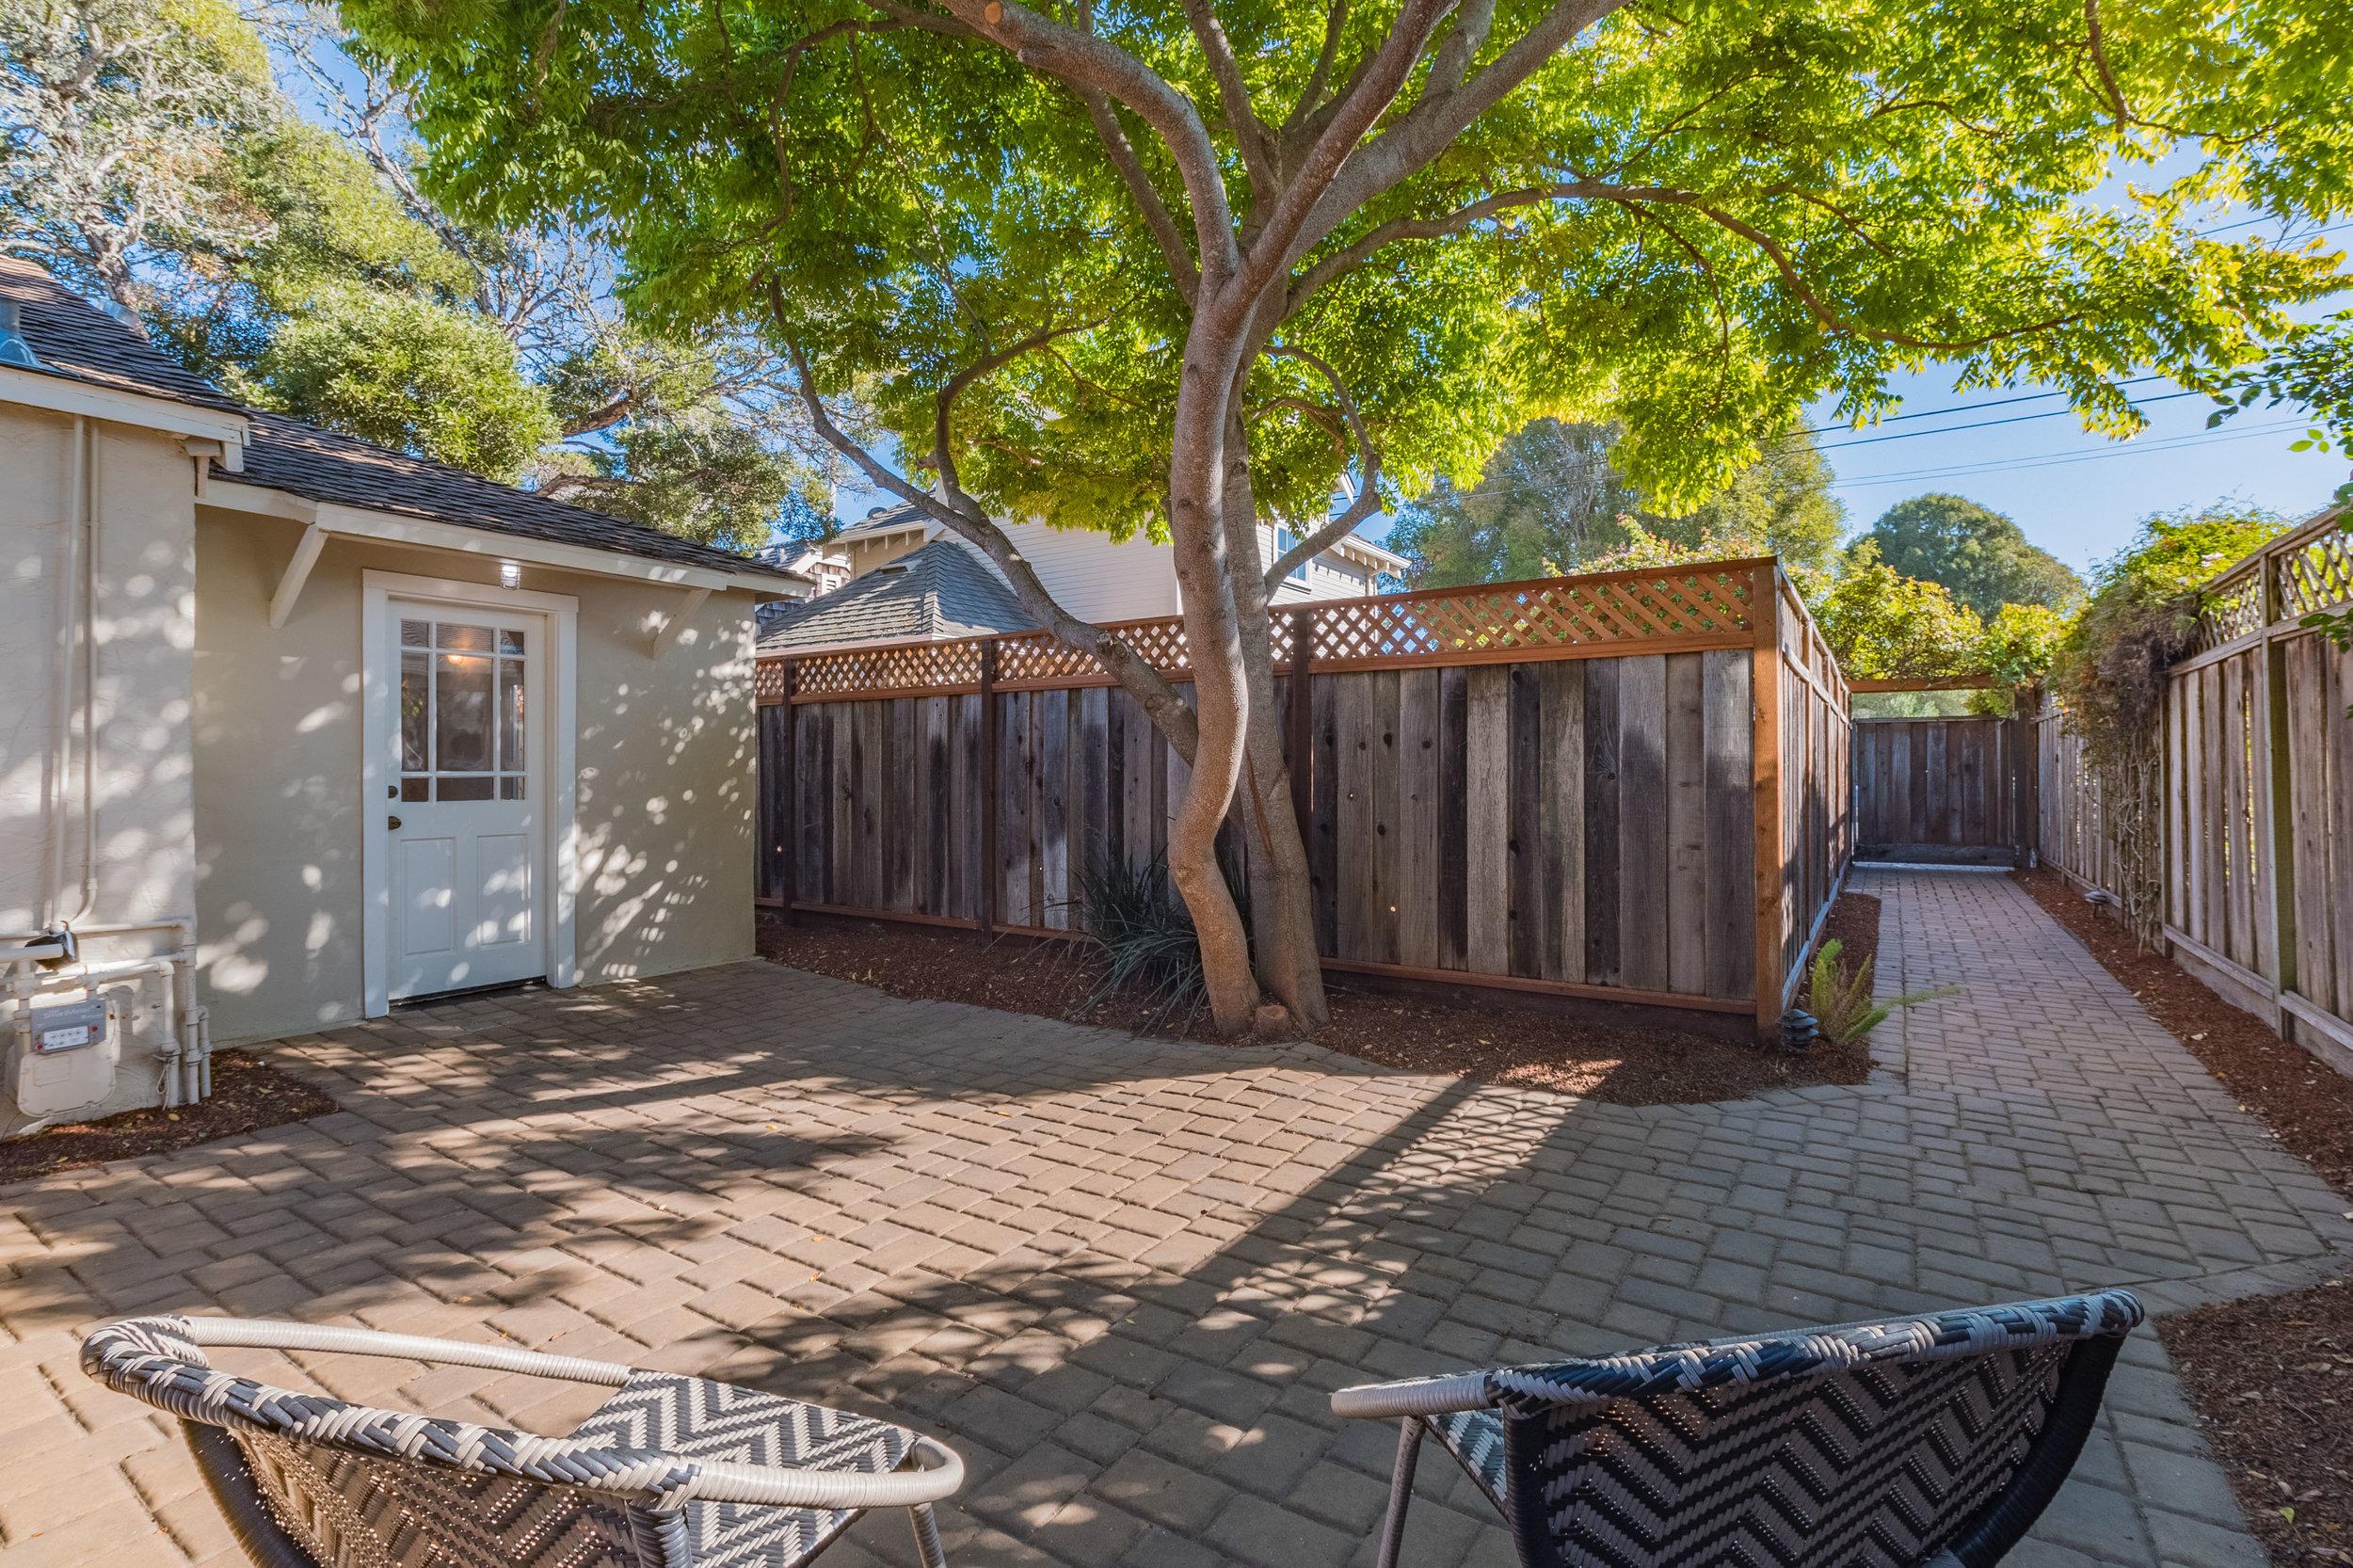 Backyard Patio with Shade